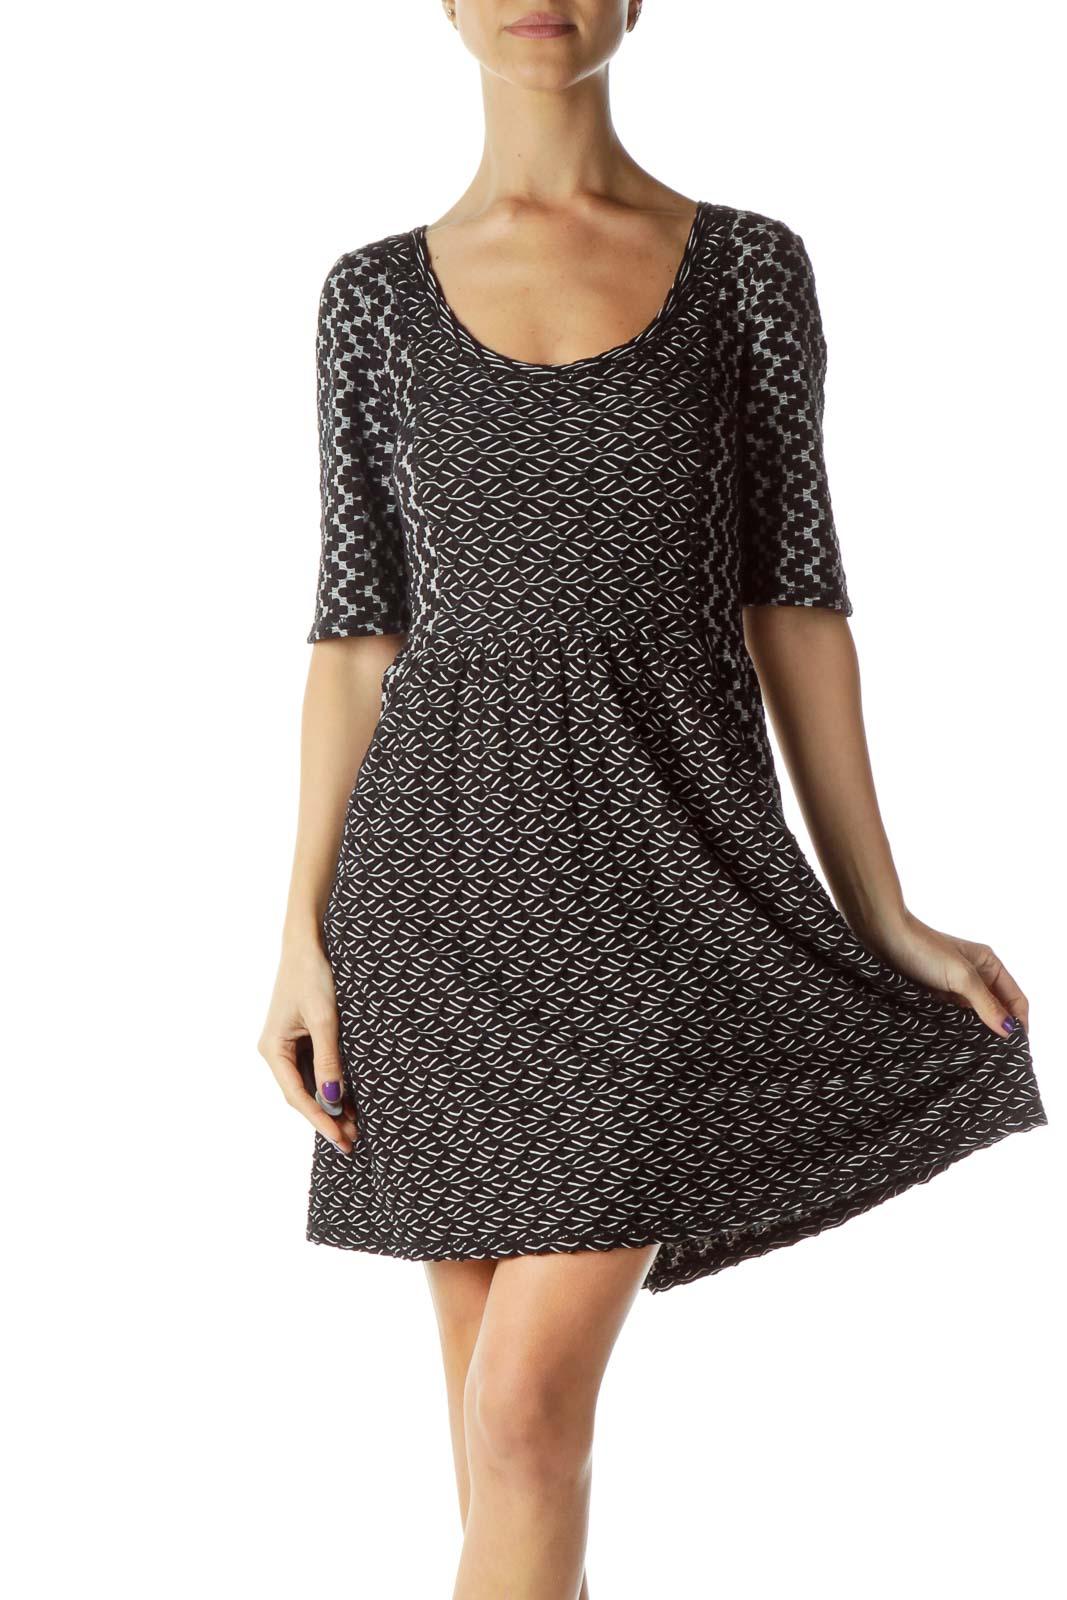 Black White Textured Woven Dress